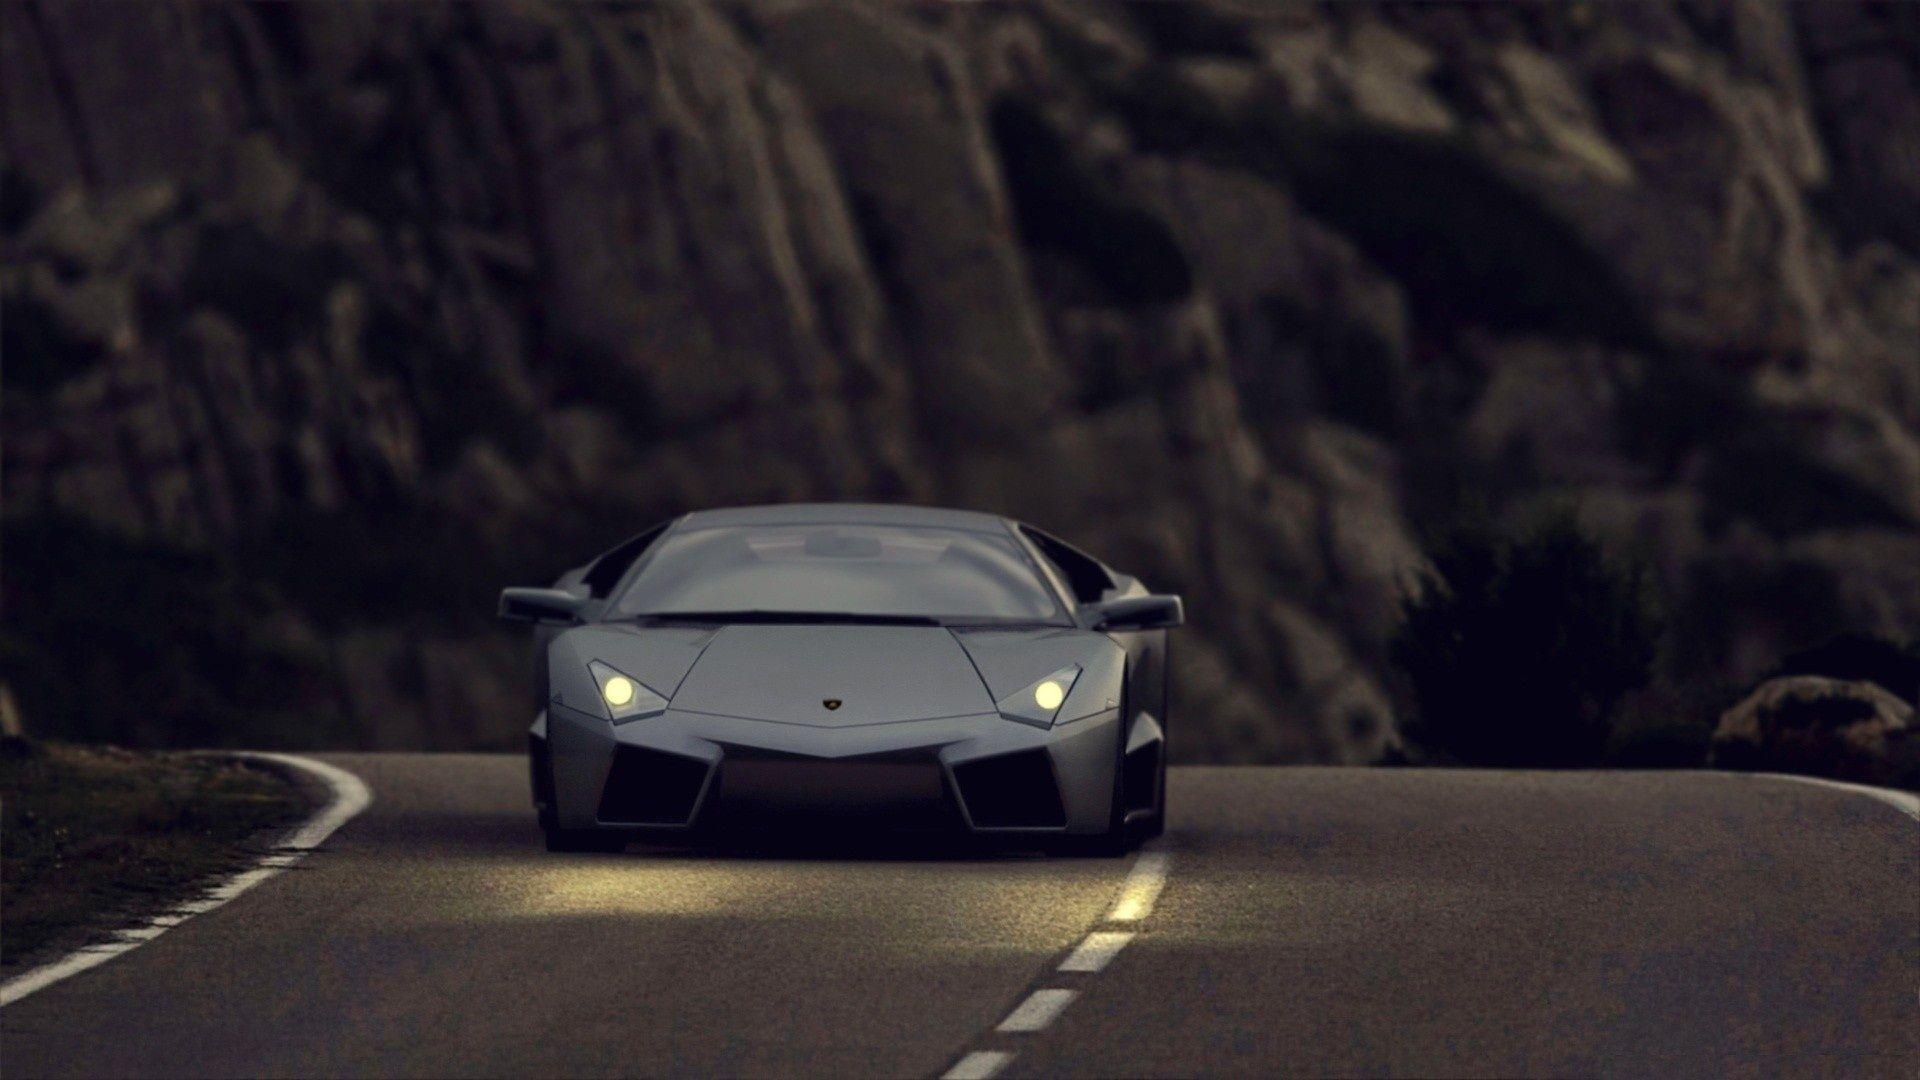 Matte Black Sports Car Wallpaper In 2020 Sports Car Wallpaper Car Wallpapers Lamborghini Reventon